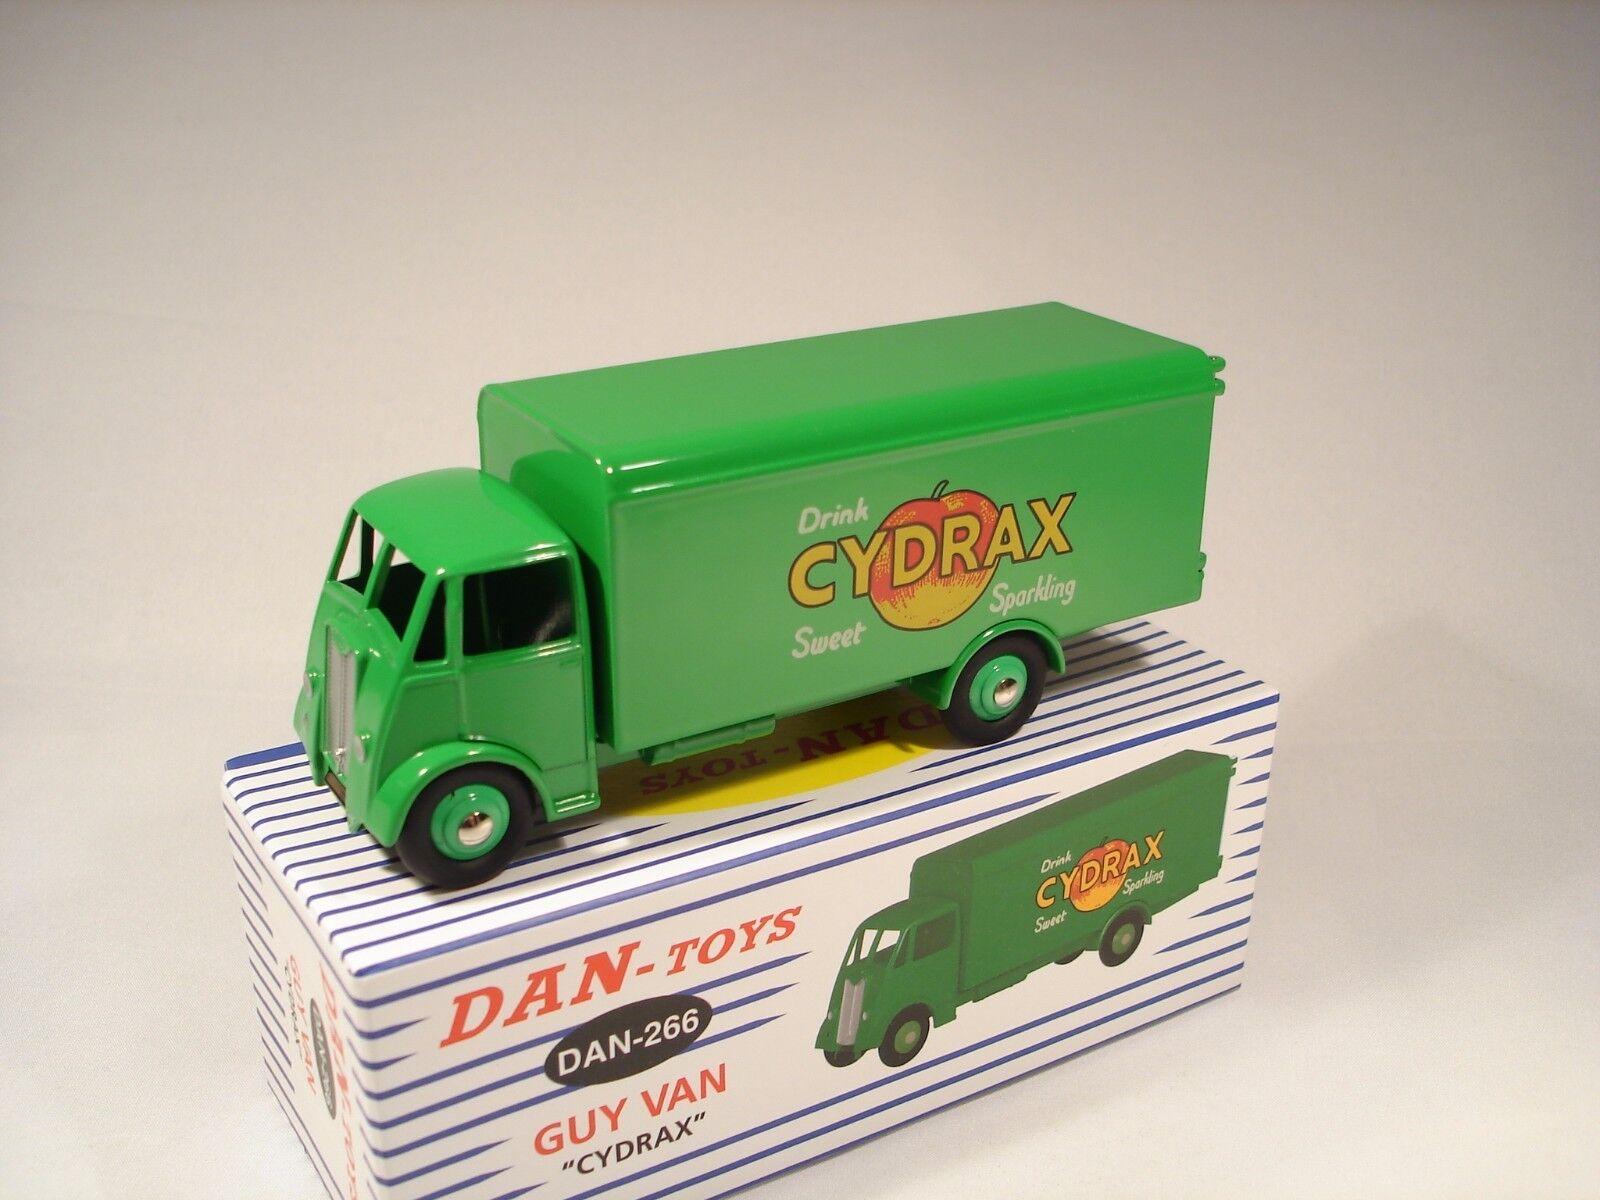 DAN TOYS  Guy Van Cidrax (Exclusivité Dan-Toys, Série de 500 Ex.DAN 266